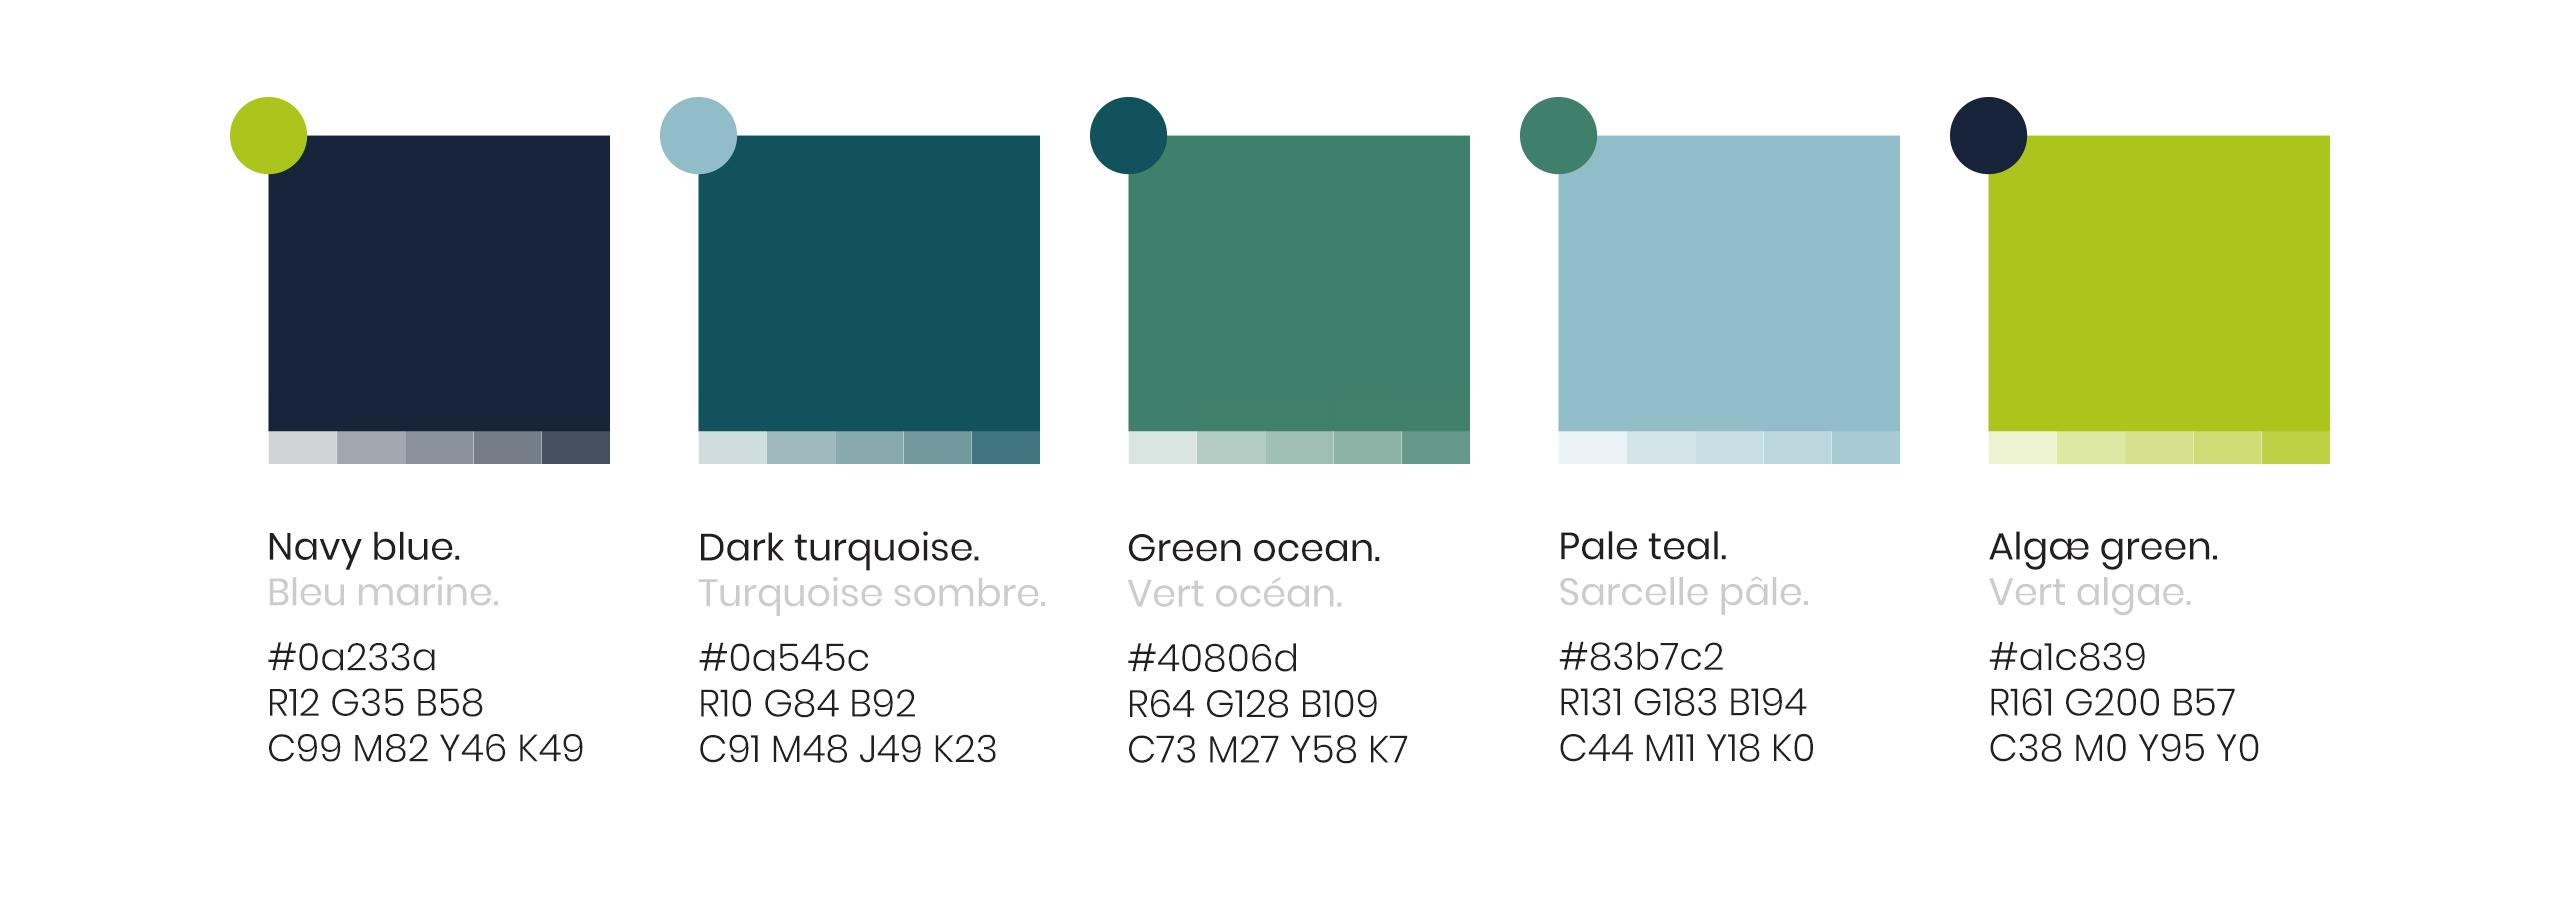 Kertalg - bioraffinerie environnementale - Palette de couleurs avancée